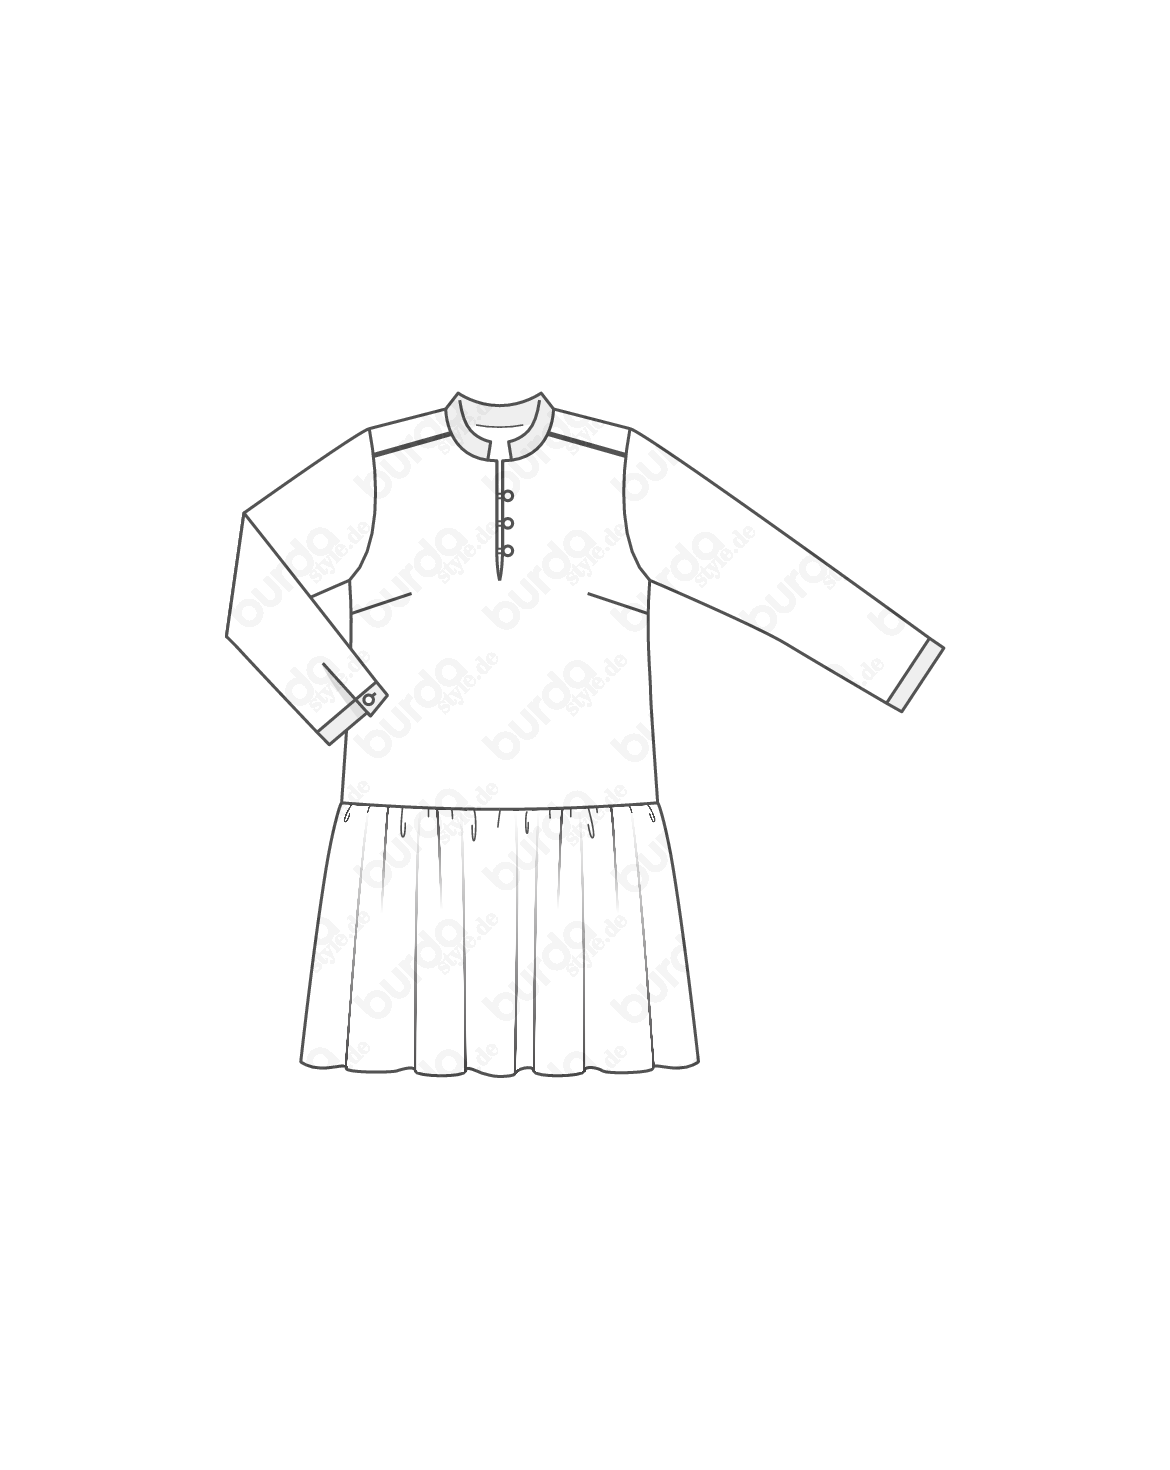 burda style, Schnittmuster, Kleid fs 2014 #431, Oben elegante Bluse ...